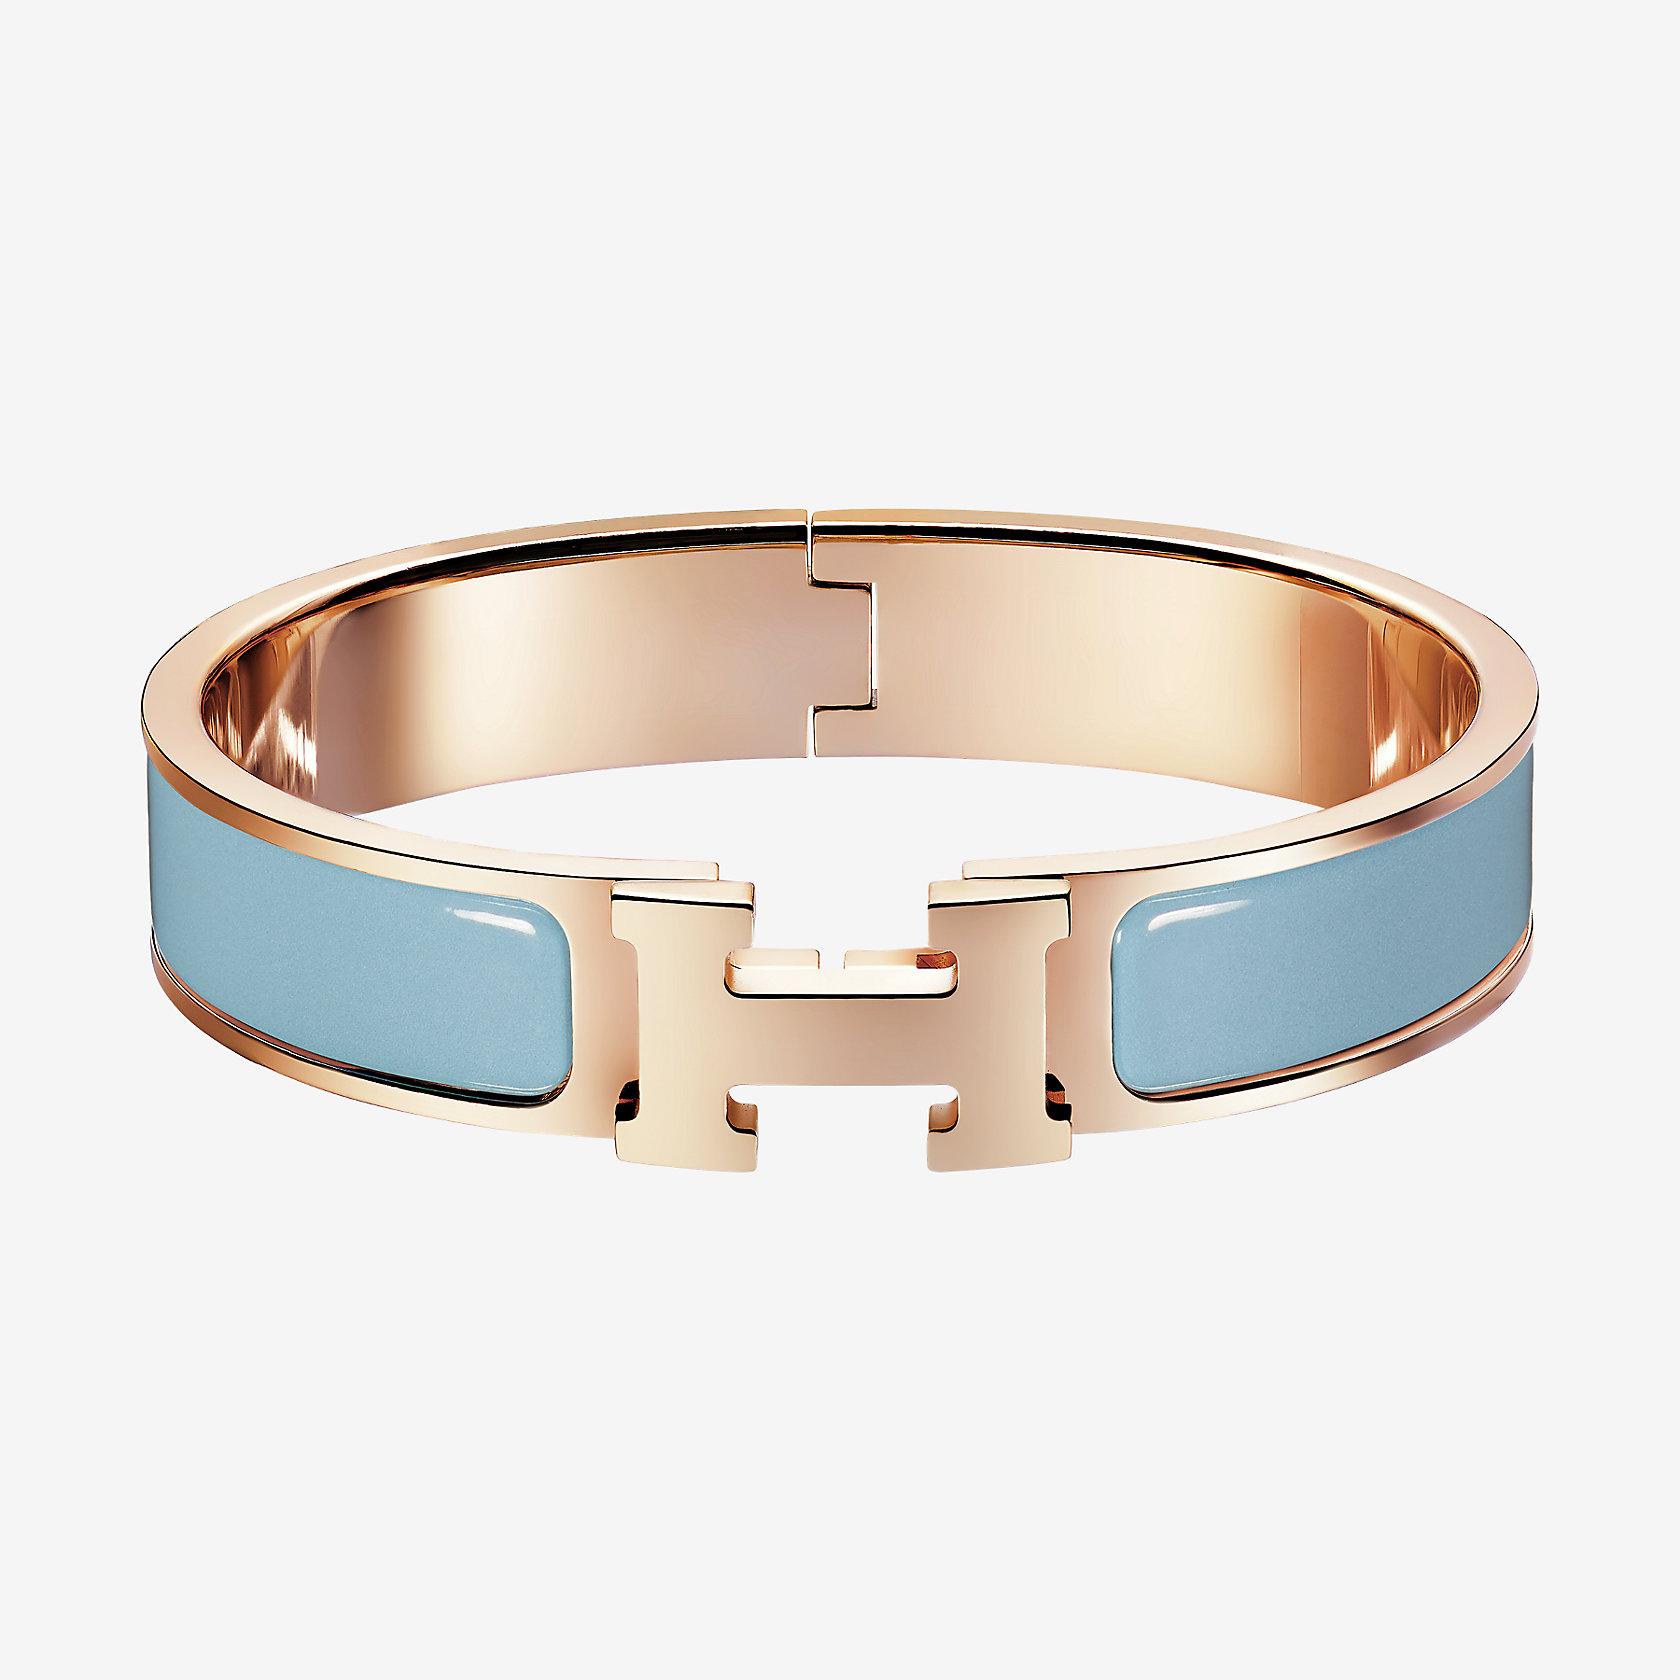 ffe0b5d3d15 Clic H bracelet | Hermès Australia